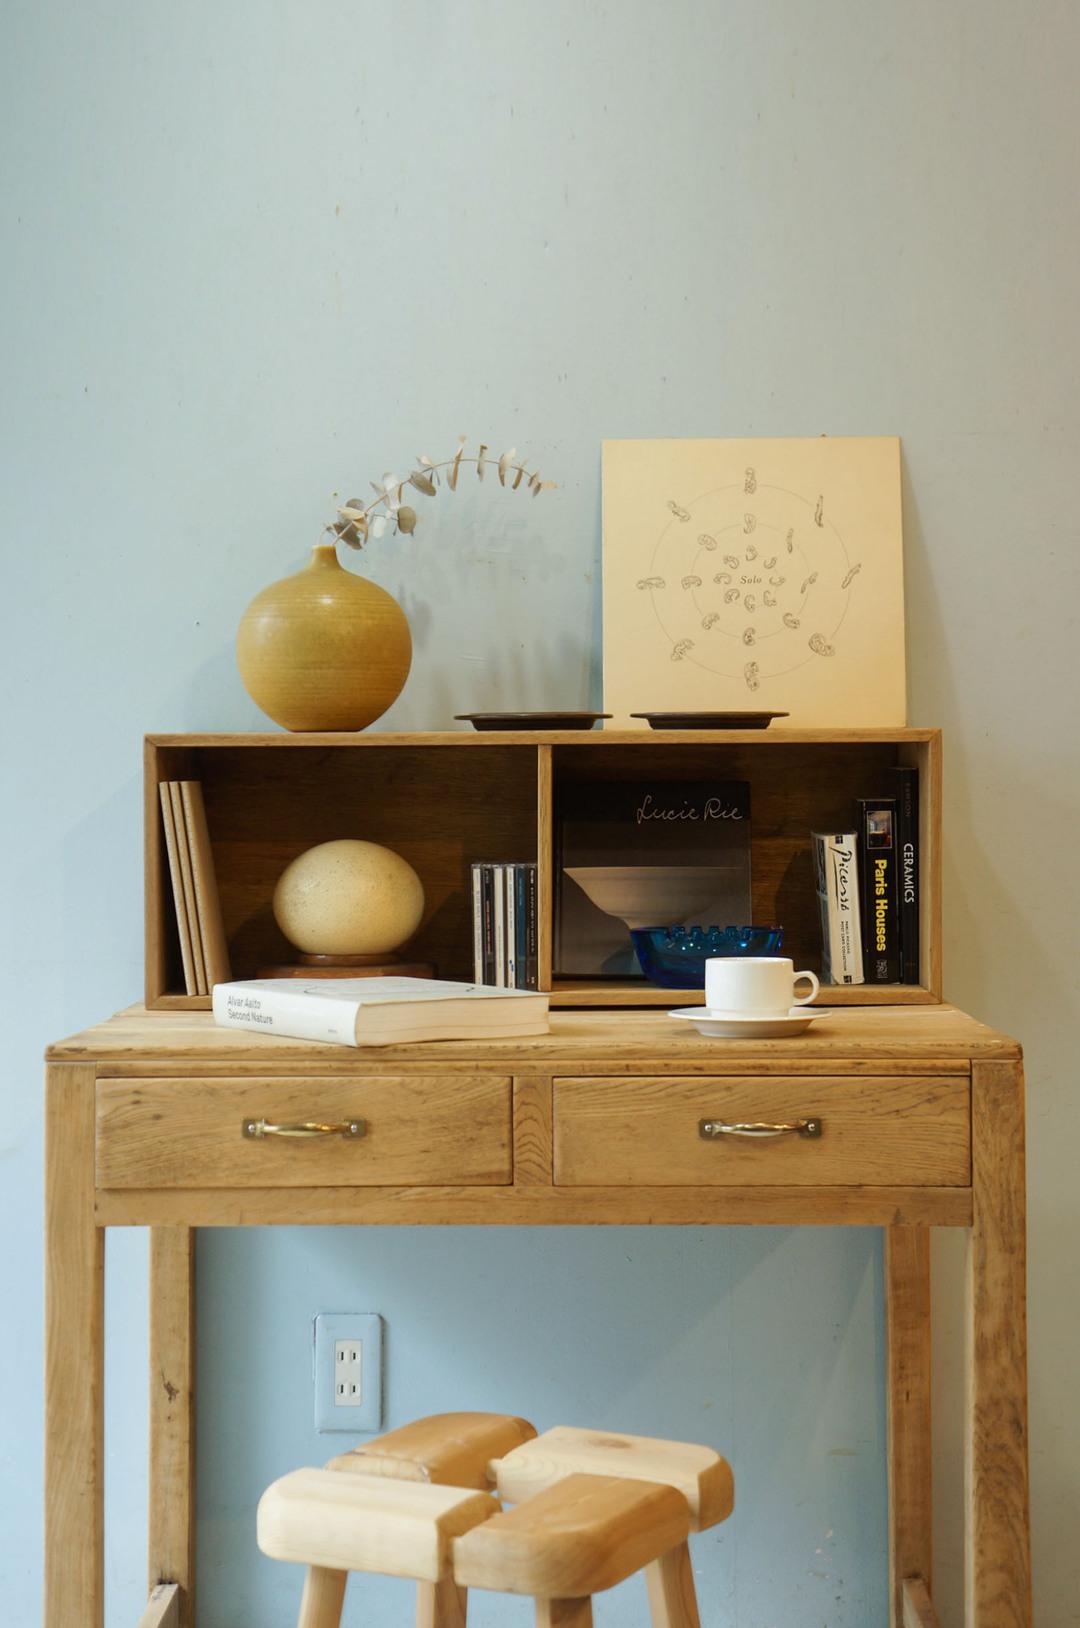 Japanese Vintage Wooden Bookcase/ジャパンヴィンテージ ウッドボックス 木箱 本箱 収納ボックス レトロ シャビー